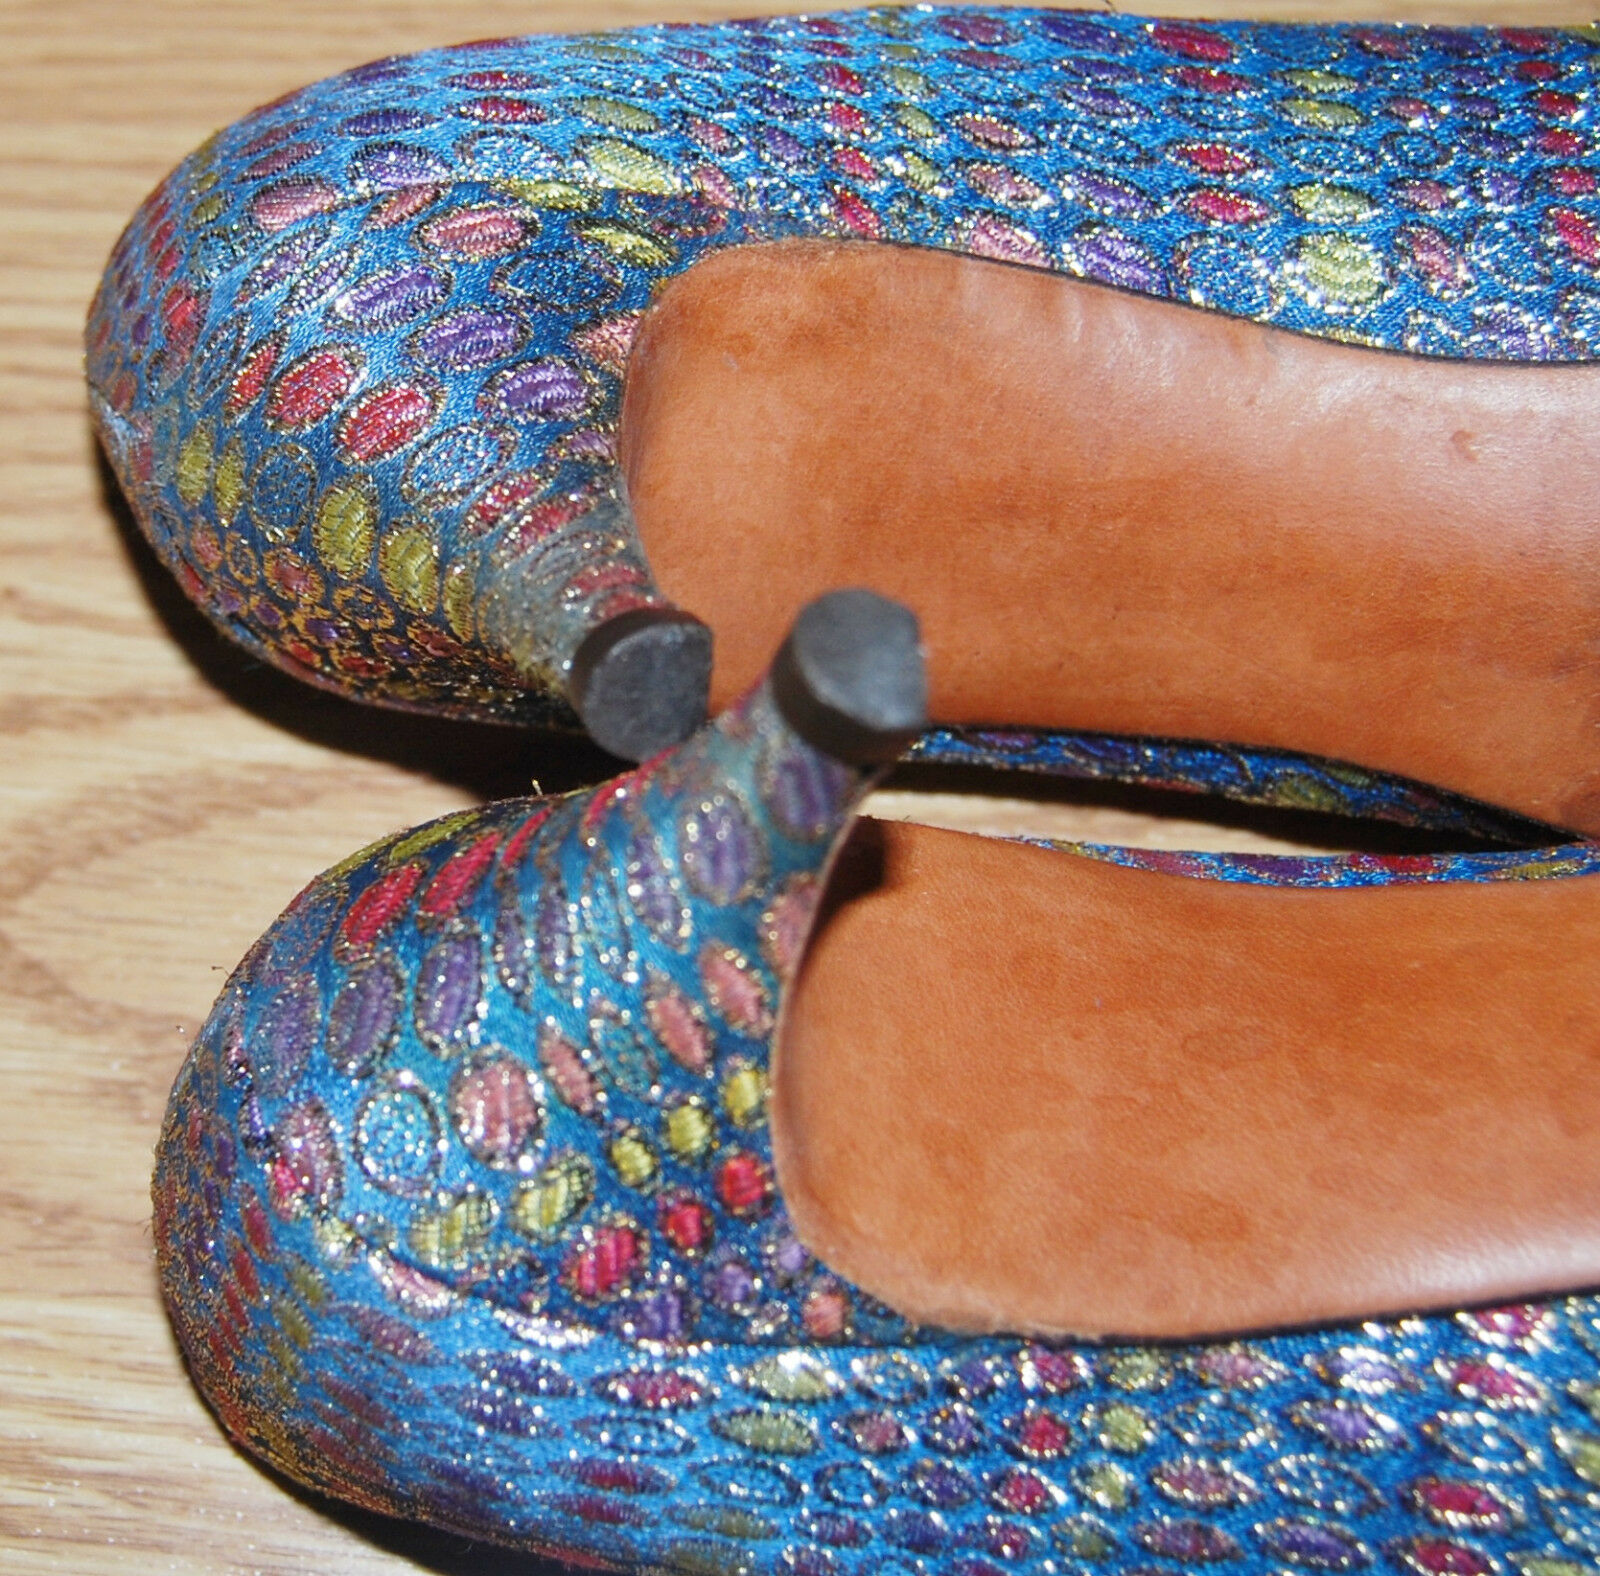 Vintage Peacock Blau Gold lila lila lila coral LAME evening schuhe leather PUMPS heels 7 B 0f834a